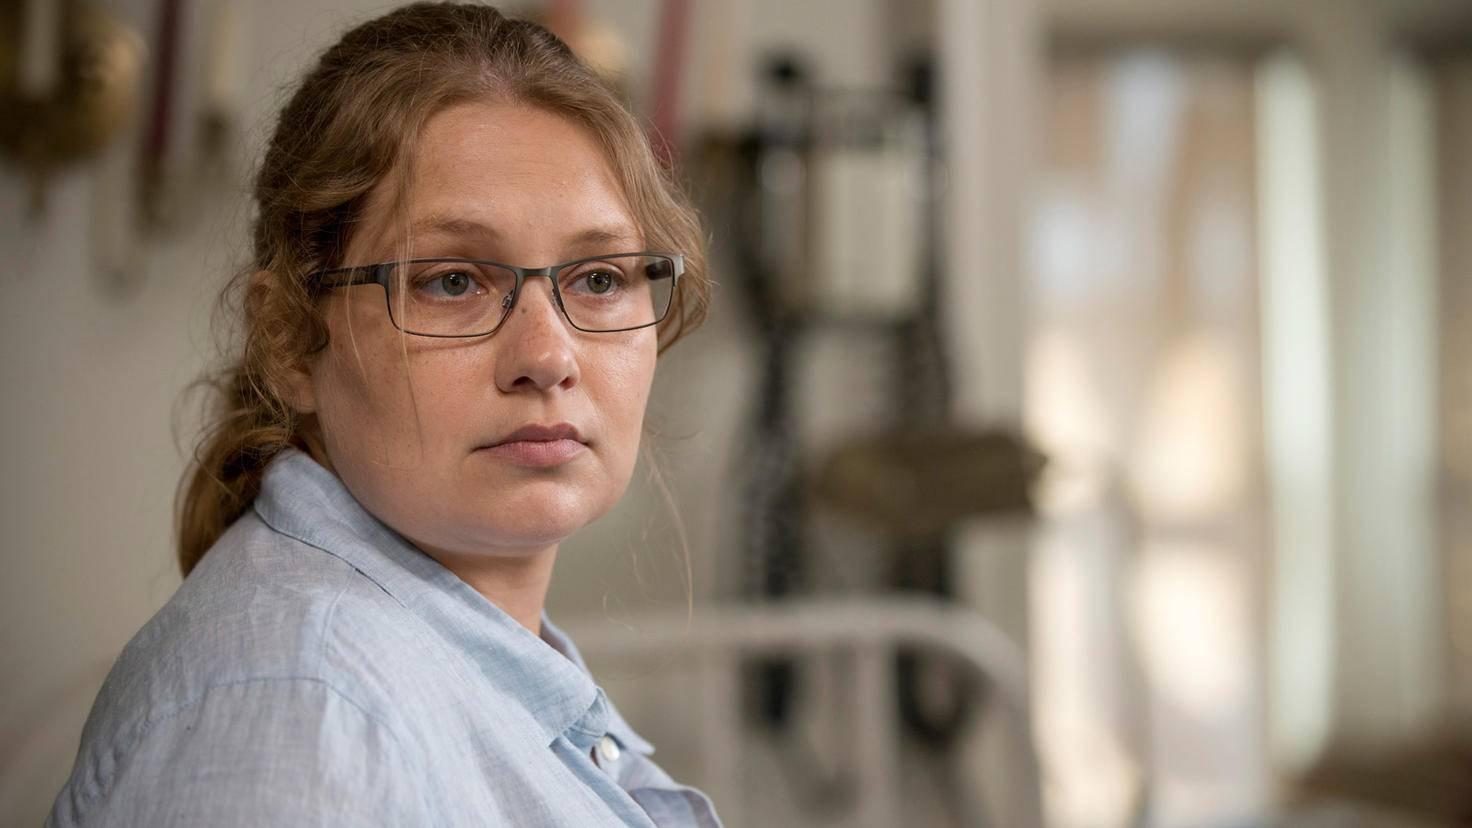 The Walking Dead-Denise-Merritt Wever-Gene Page-AMC-TWD_602_GP_0527_0037